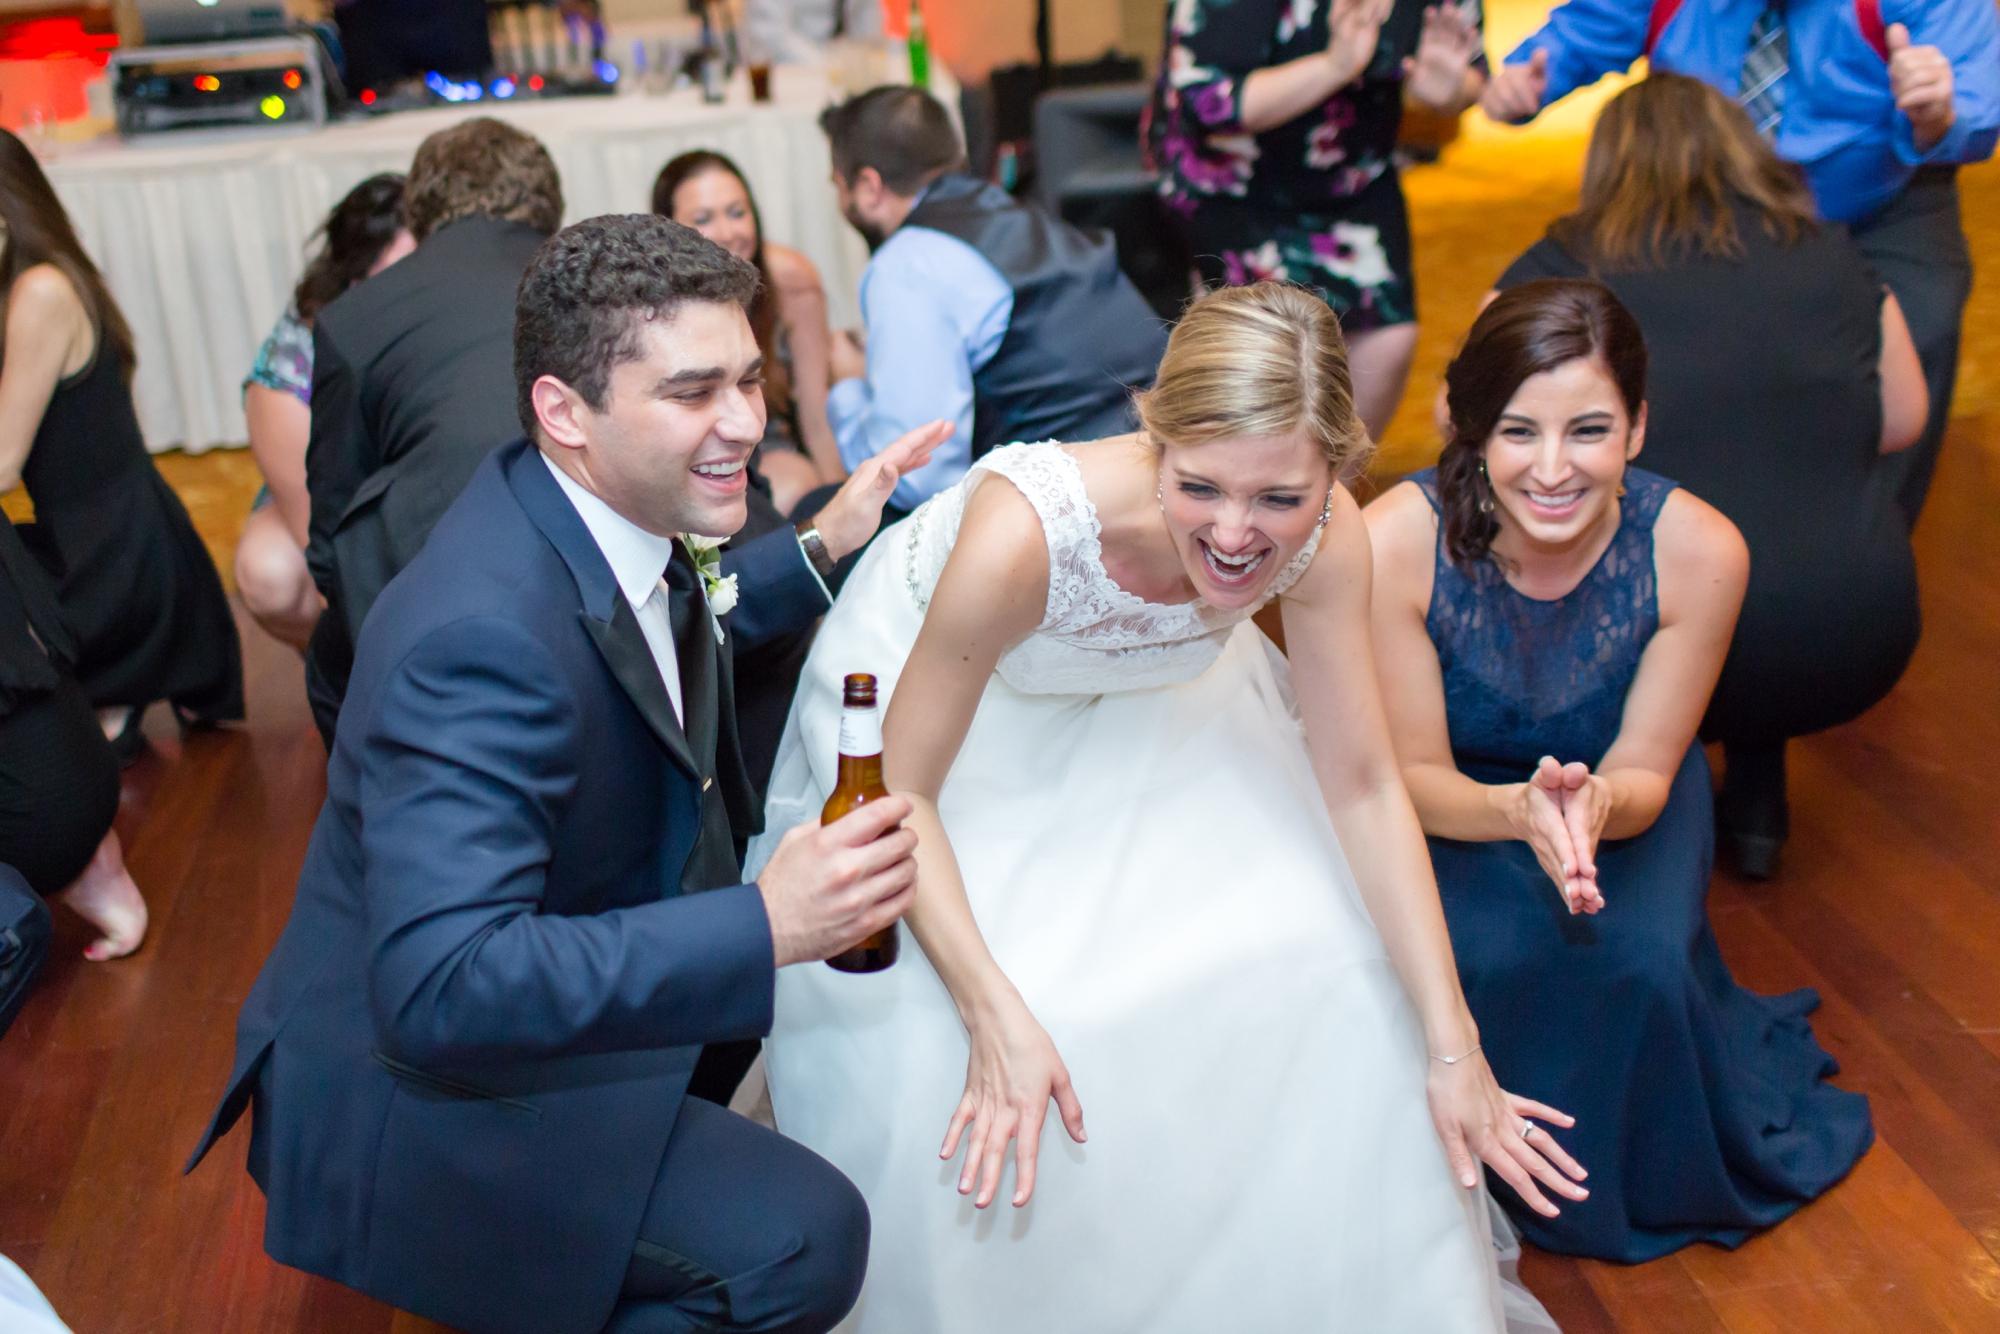 6-Finkel Wedding Reception-985_anna grace photography maryland wedding photographer turf valley.jpg